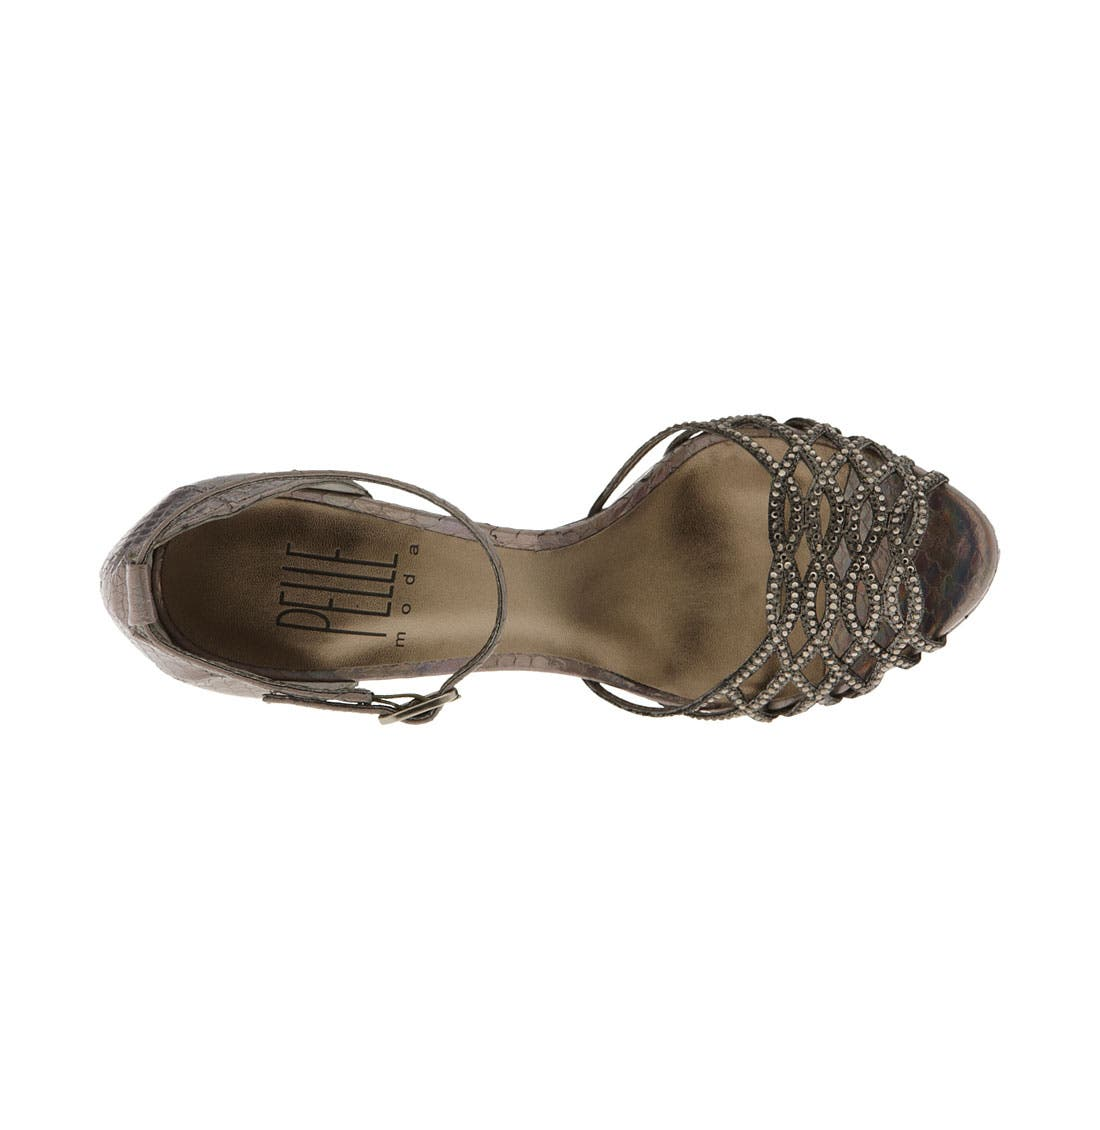 PELLE MODA,                             'Fairs' Platform Sandal,                             Alternate thumbnail 3, color,                             040